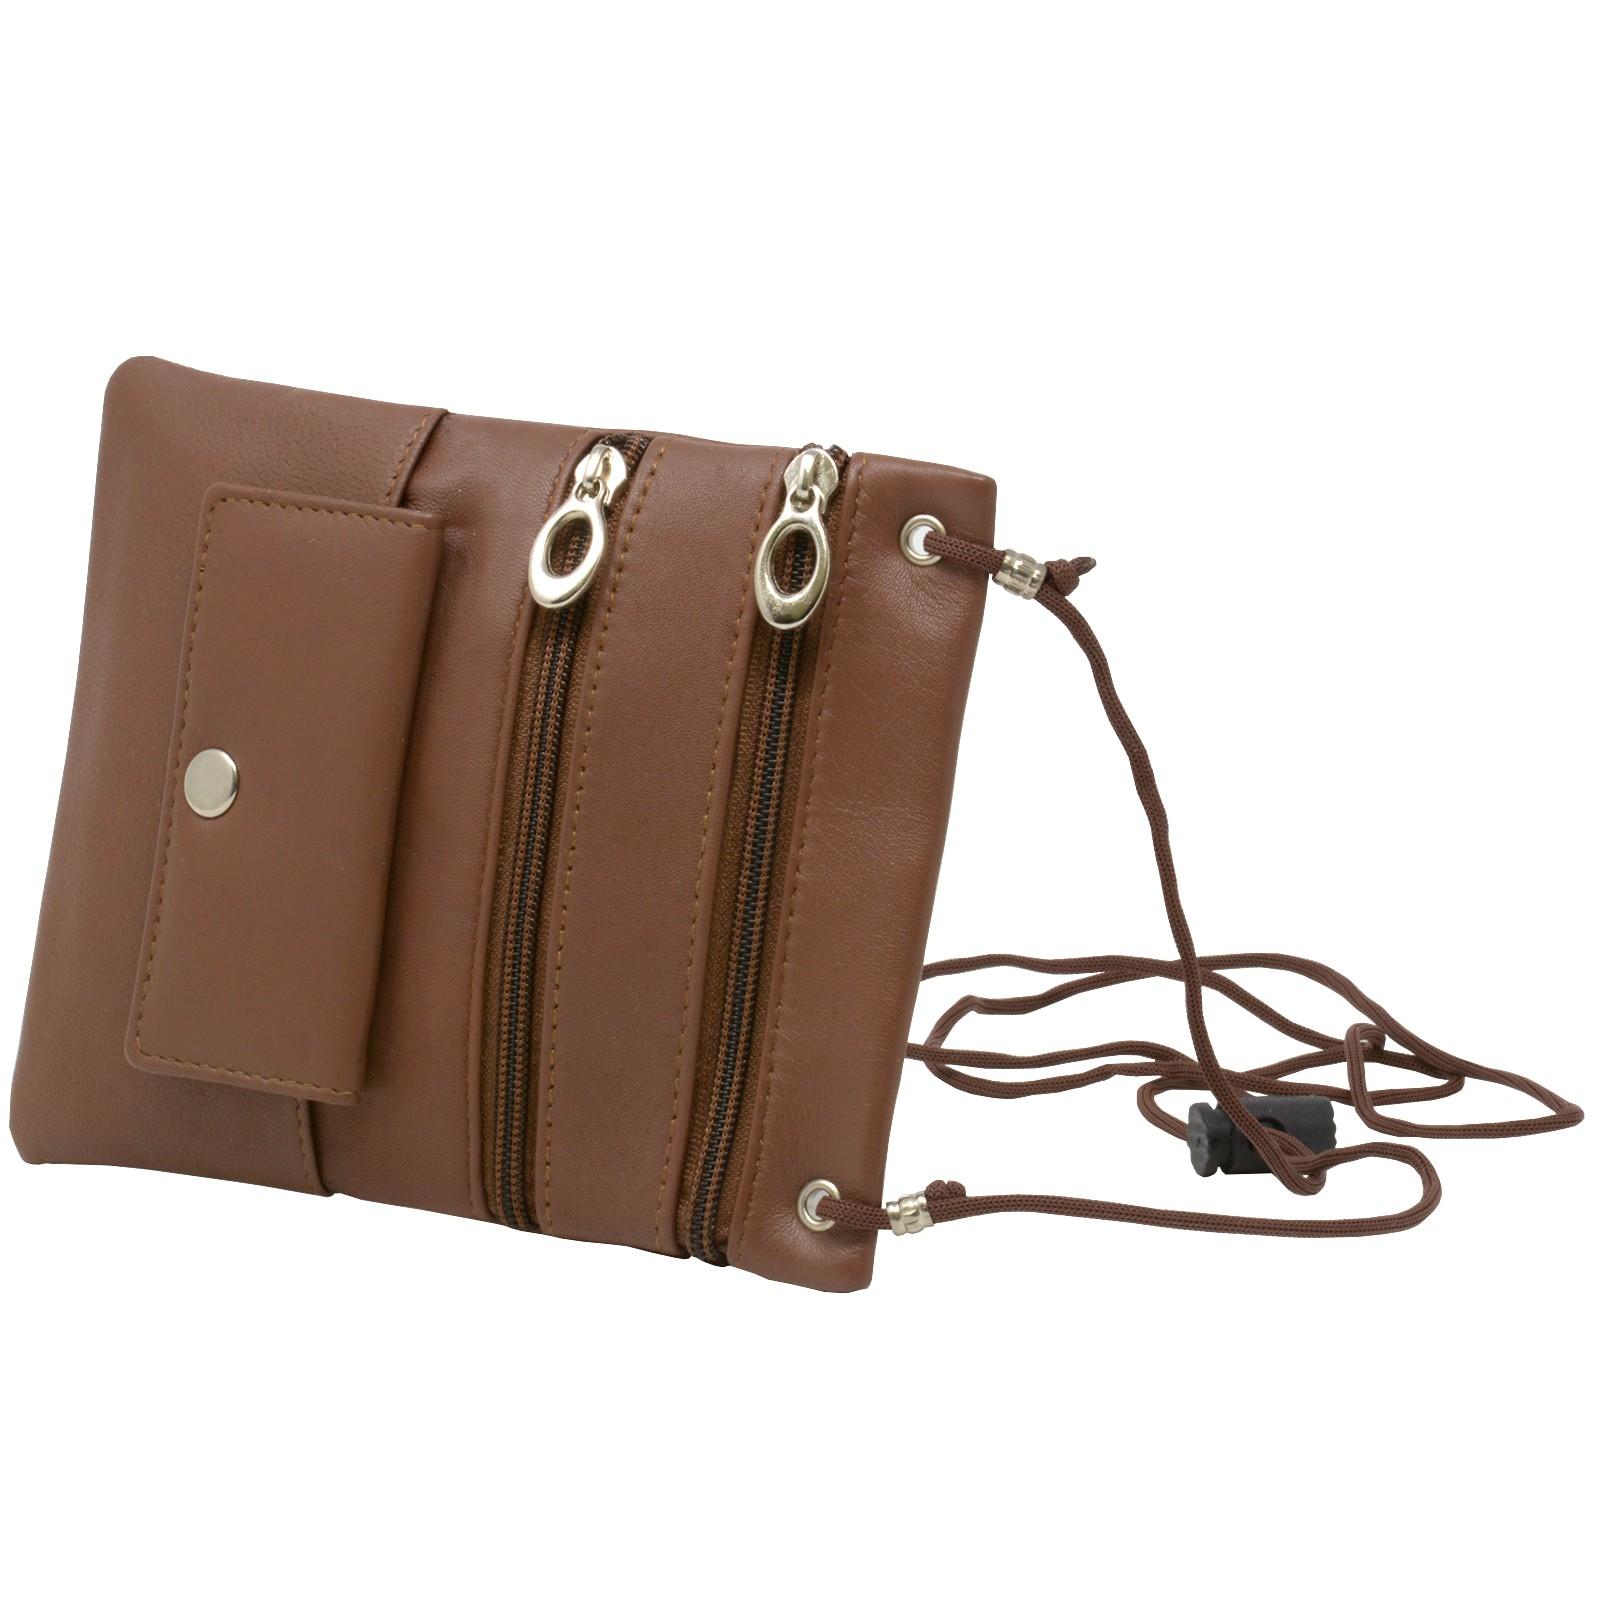 Soft-Leather-Purse-Organizer-Shoulder-Bag-4-Pocket-Micro-Handbag-Travel-Wallet thumbnail 18